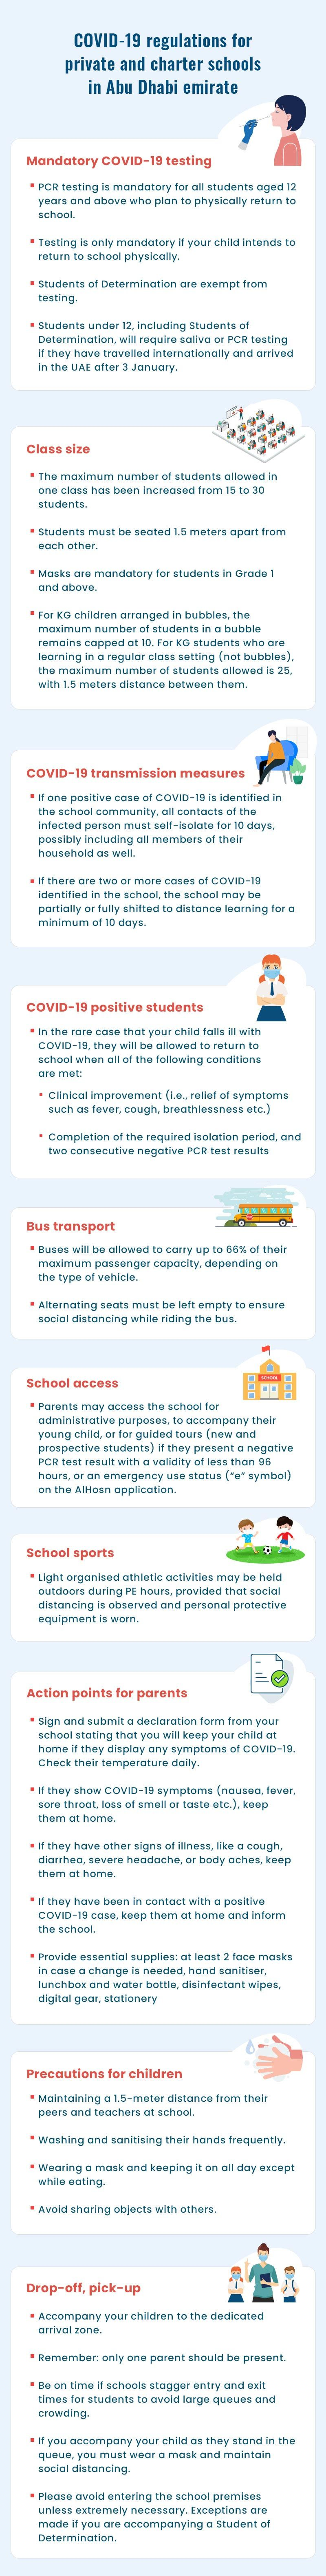 School safety regulations